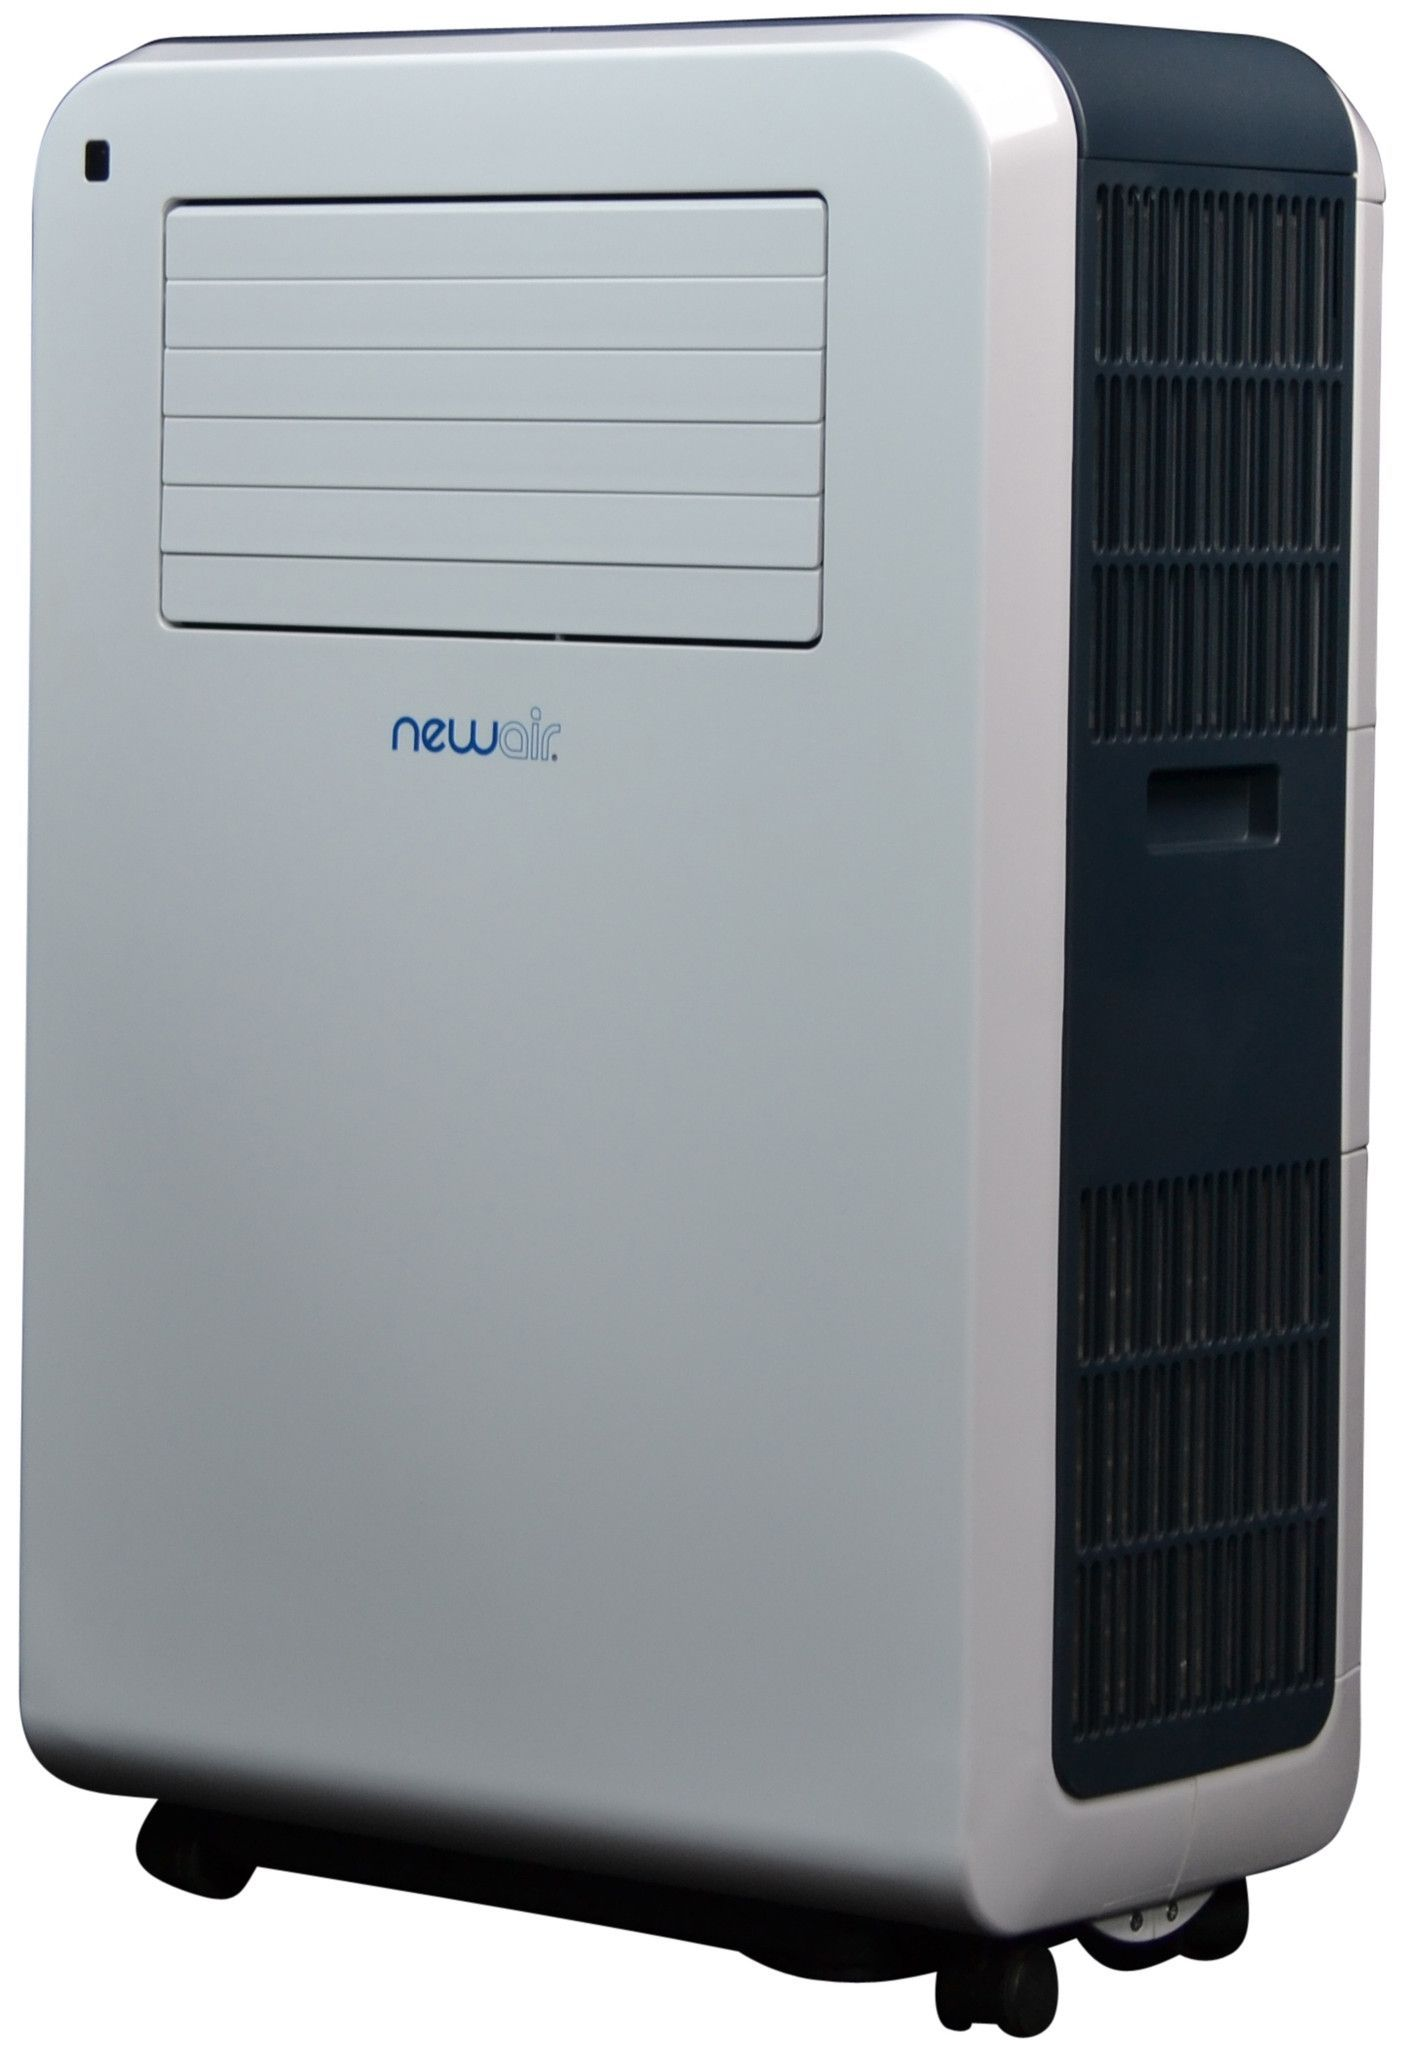 NewAir AC12200E 12,000 BTU Portable Air Conditioner